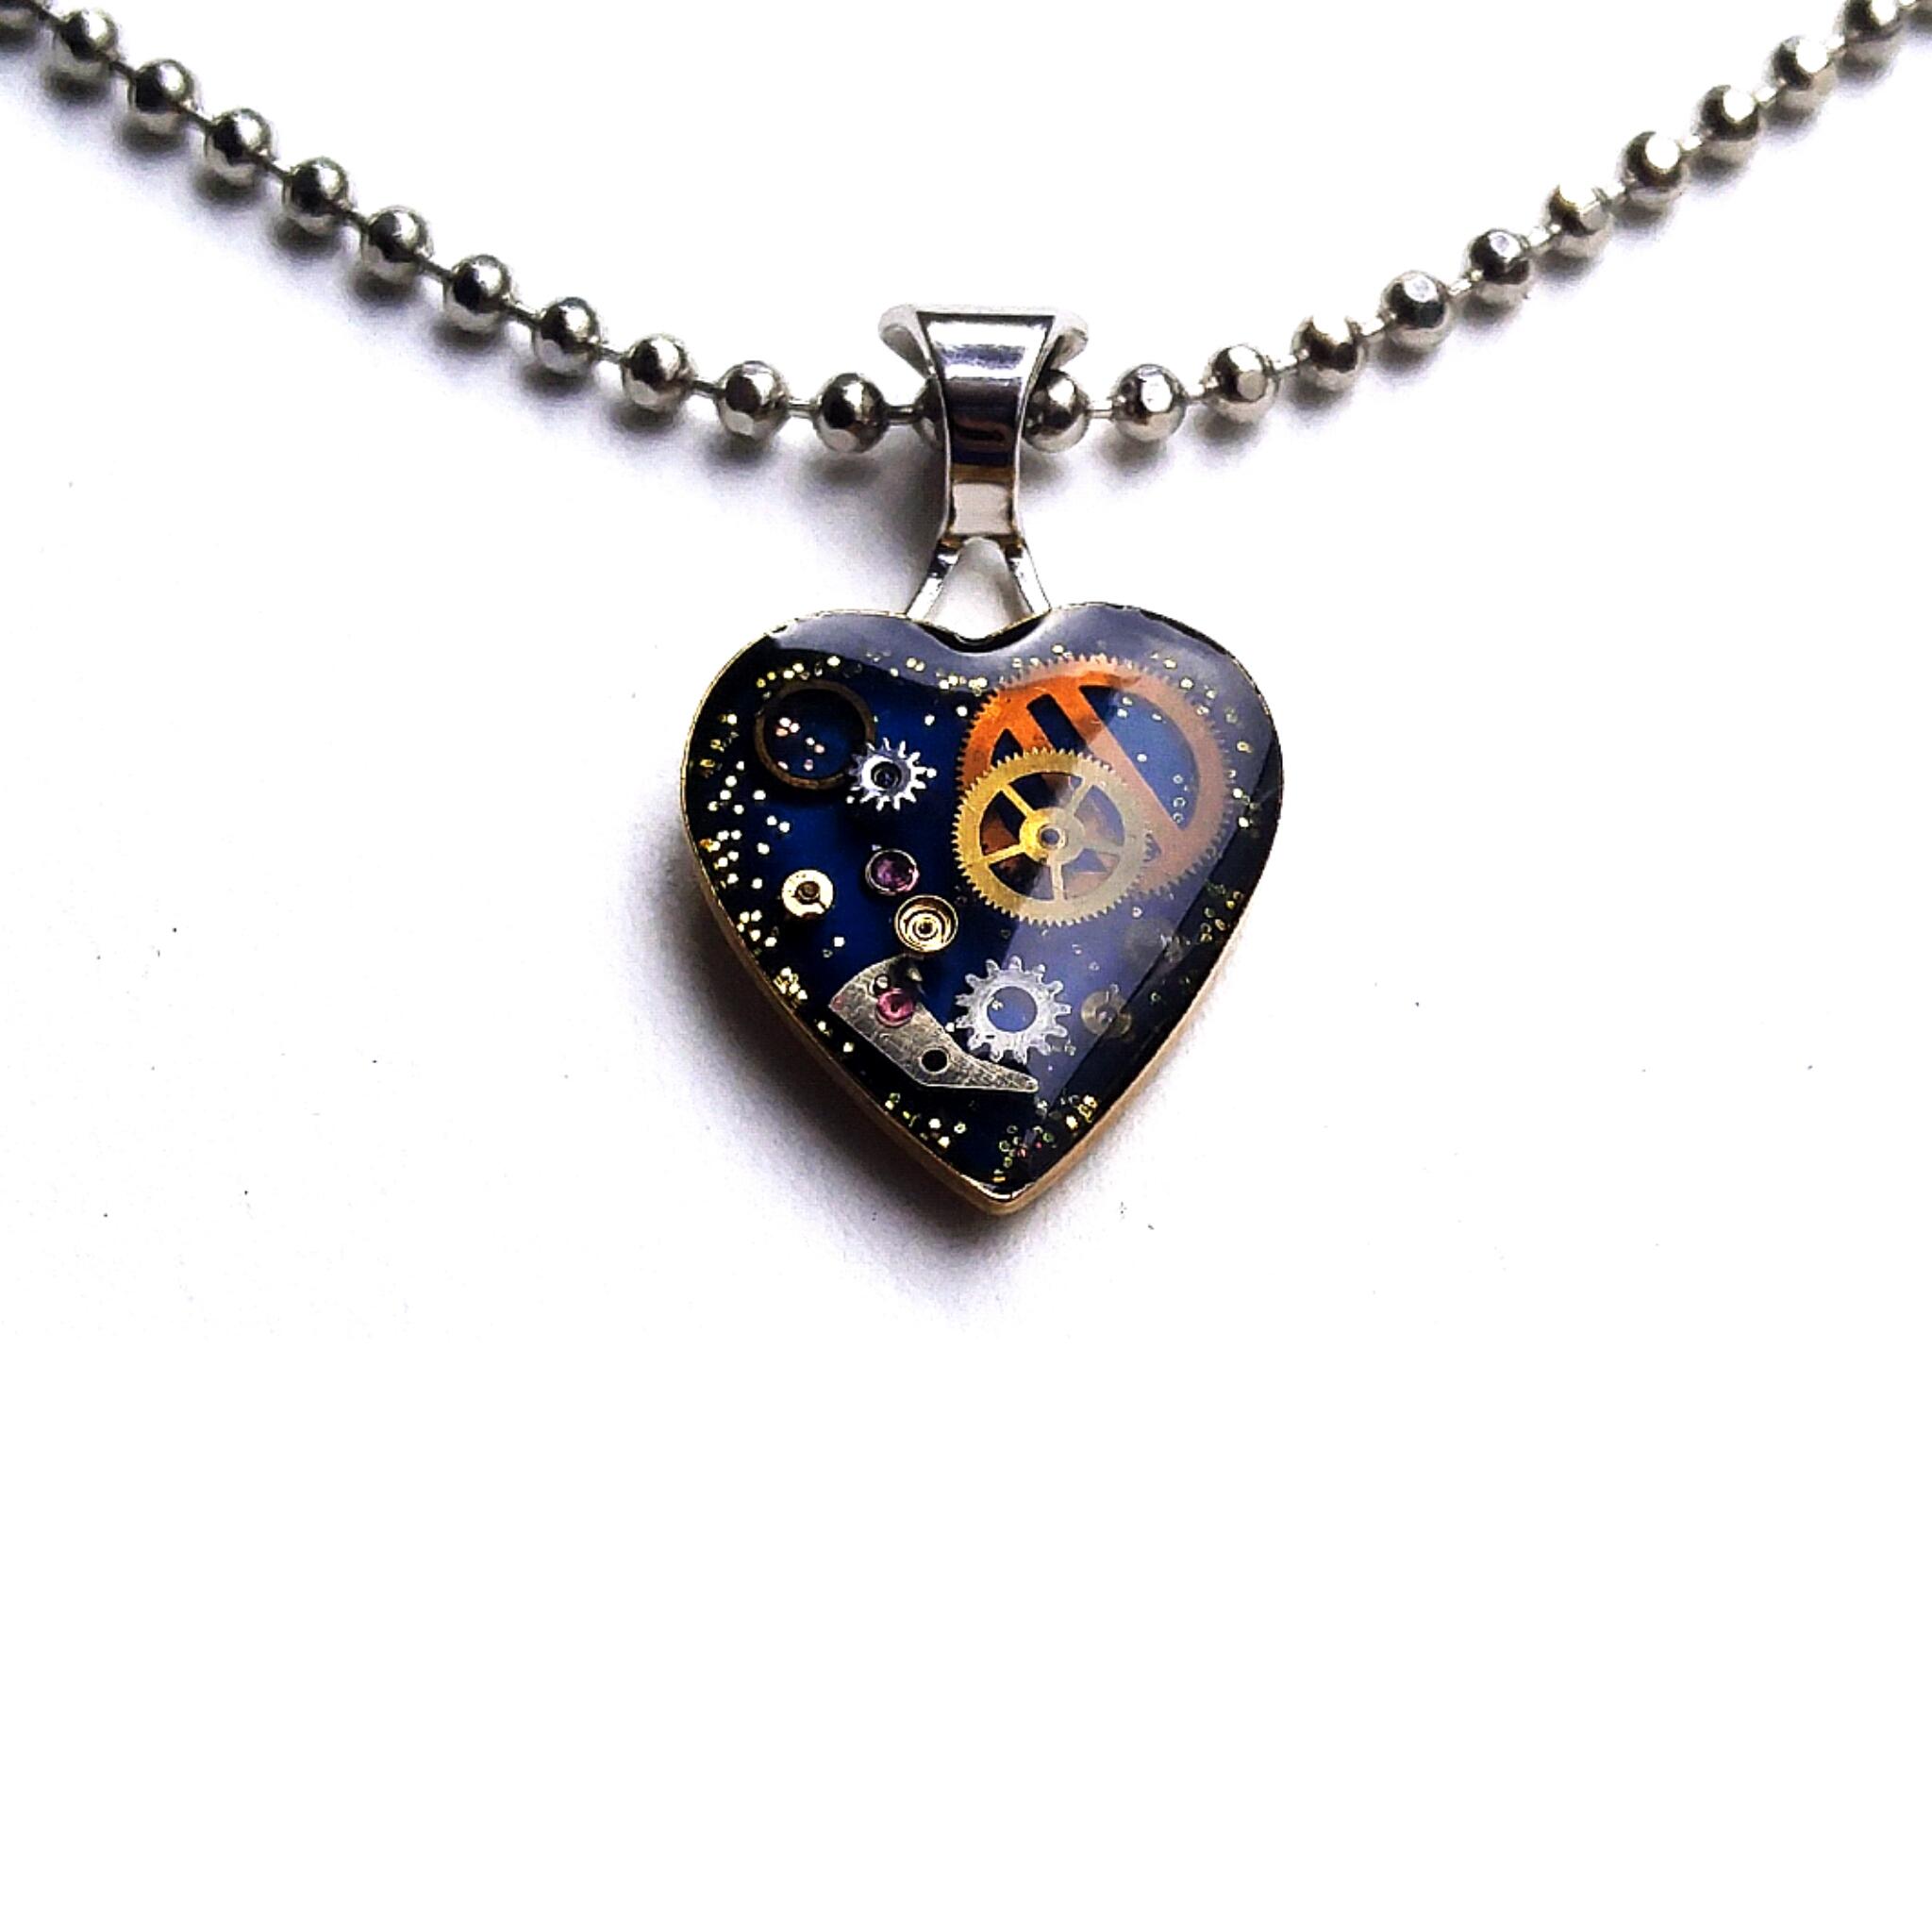 aminda-wood-mini-mechanical-watch-parts-heart.jpg